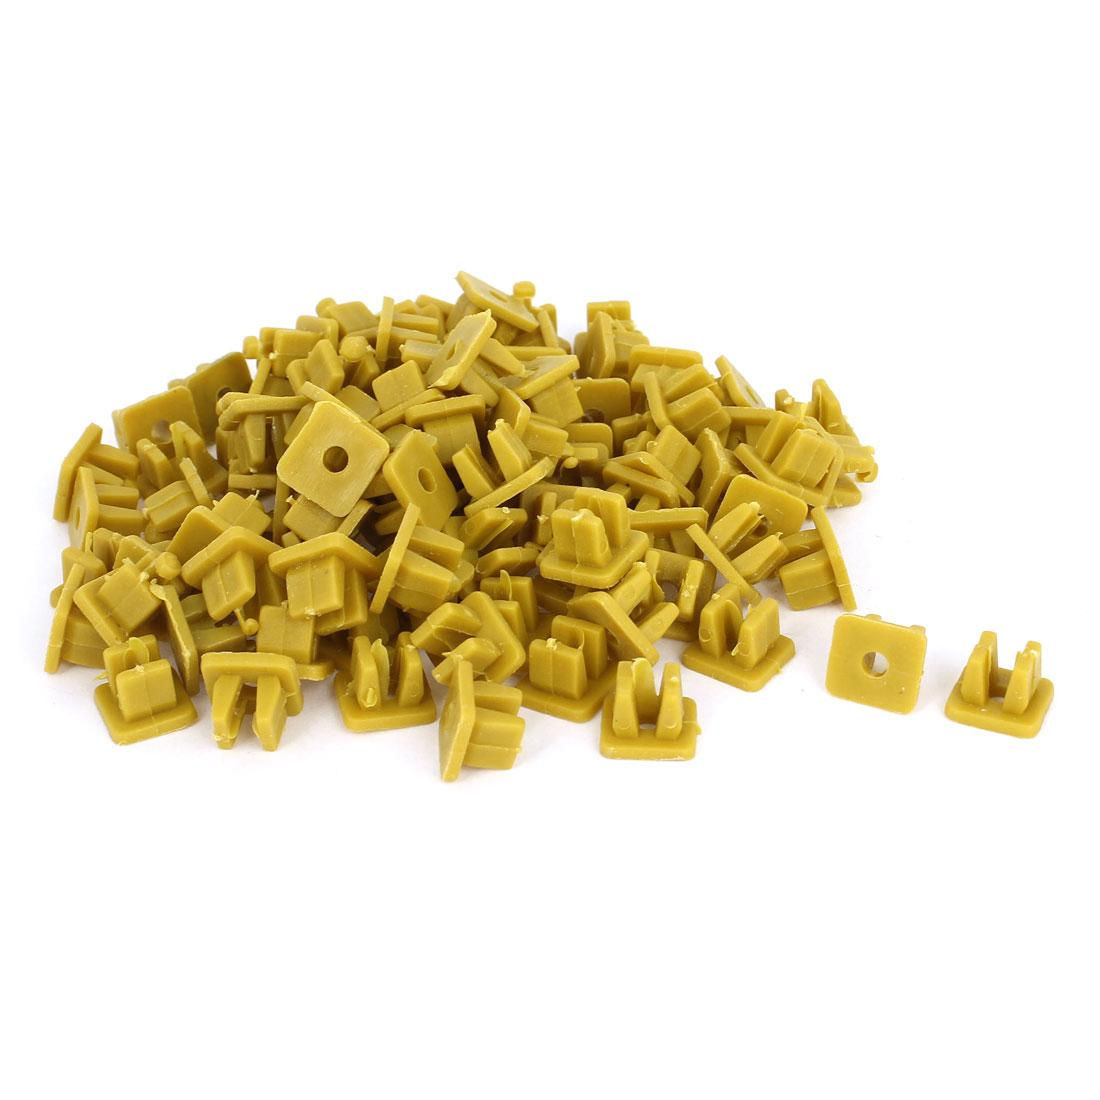 100 Pcs Khaki Plastic Rivet Trim Fastener Moulding Clips 4mm x 7mm x 10mm